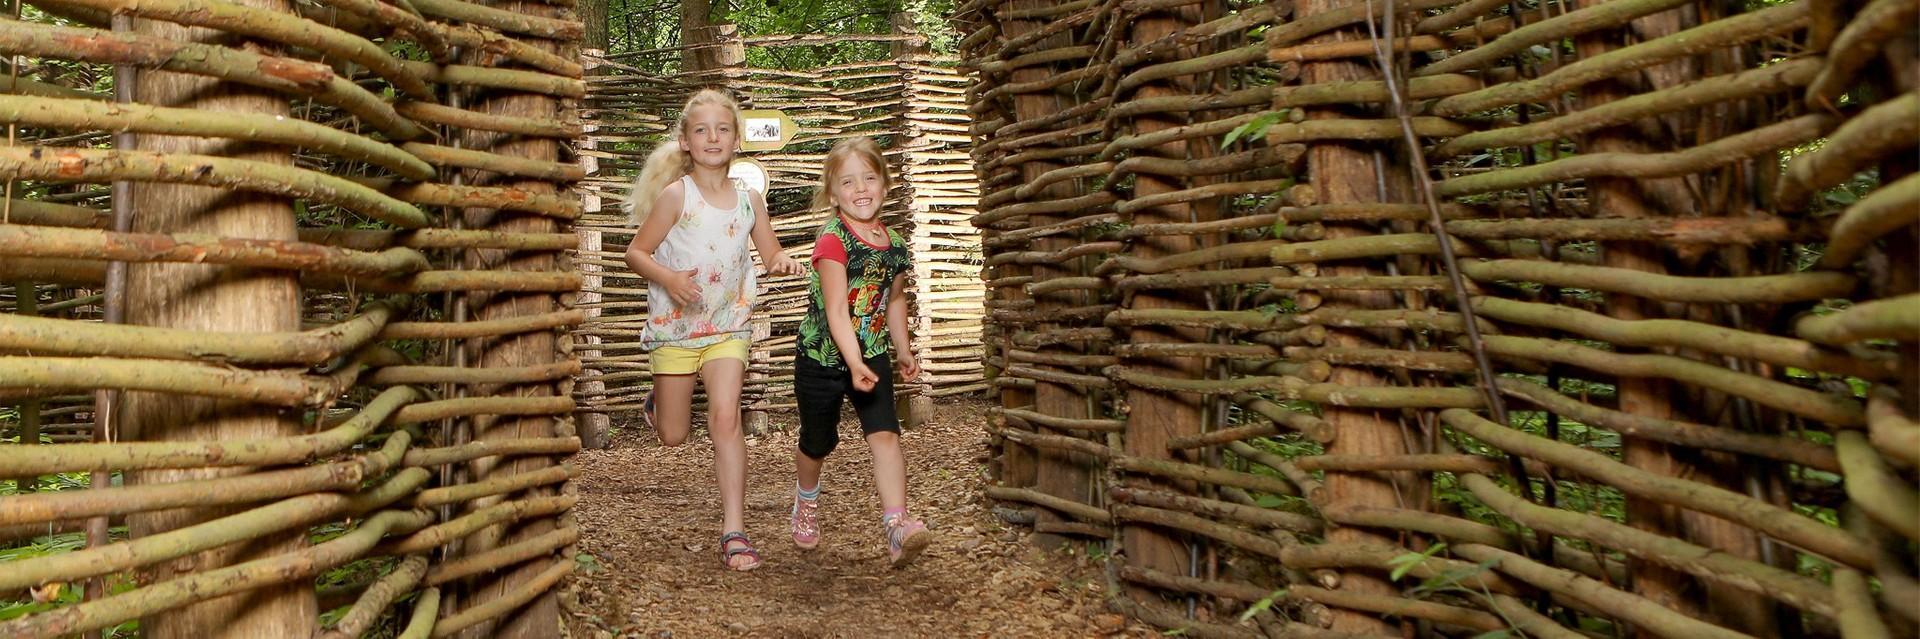 Kinder im Waldlabyrinth